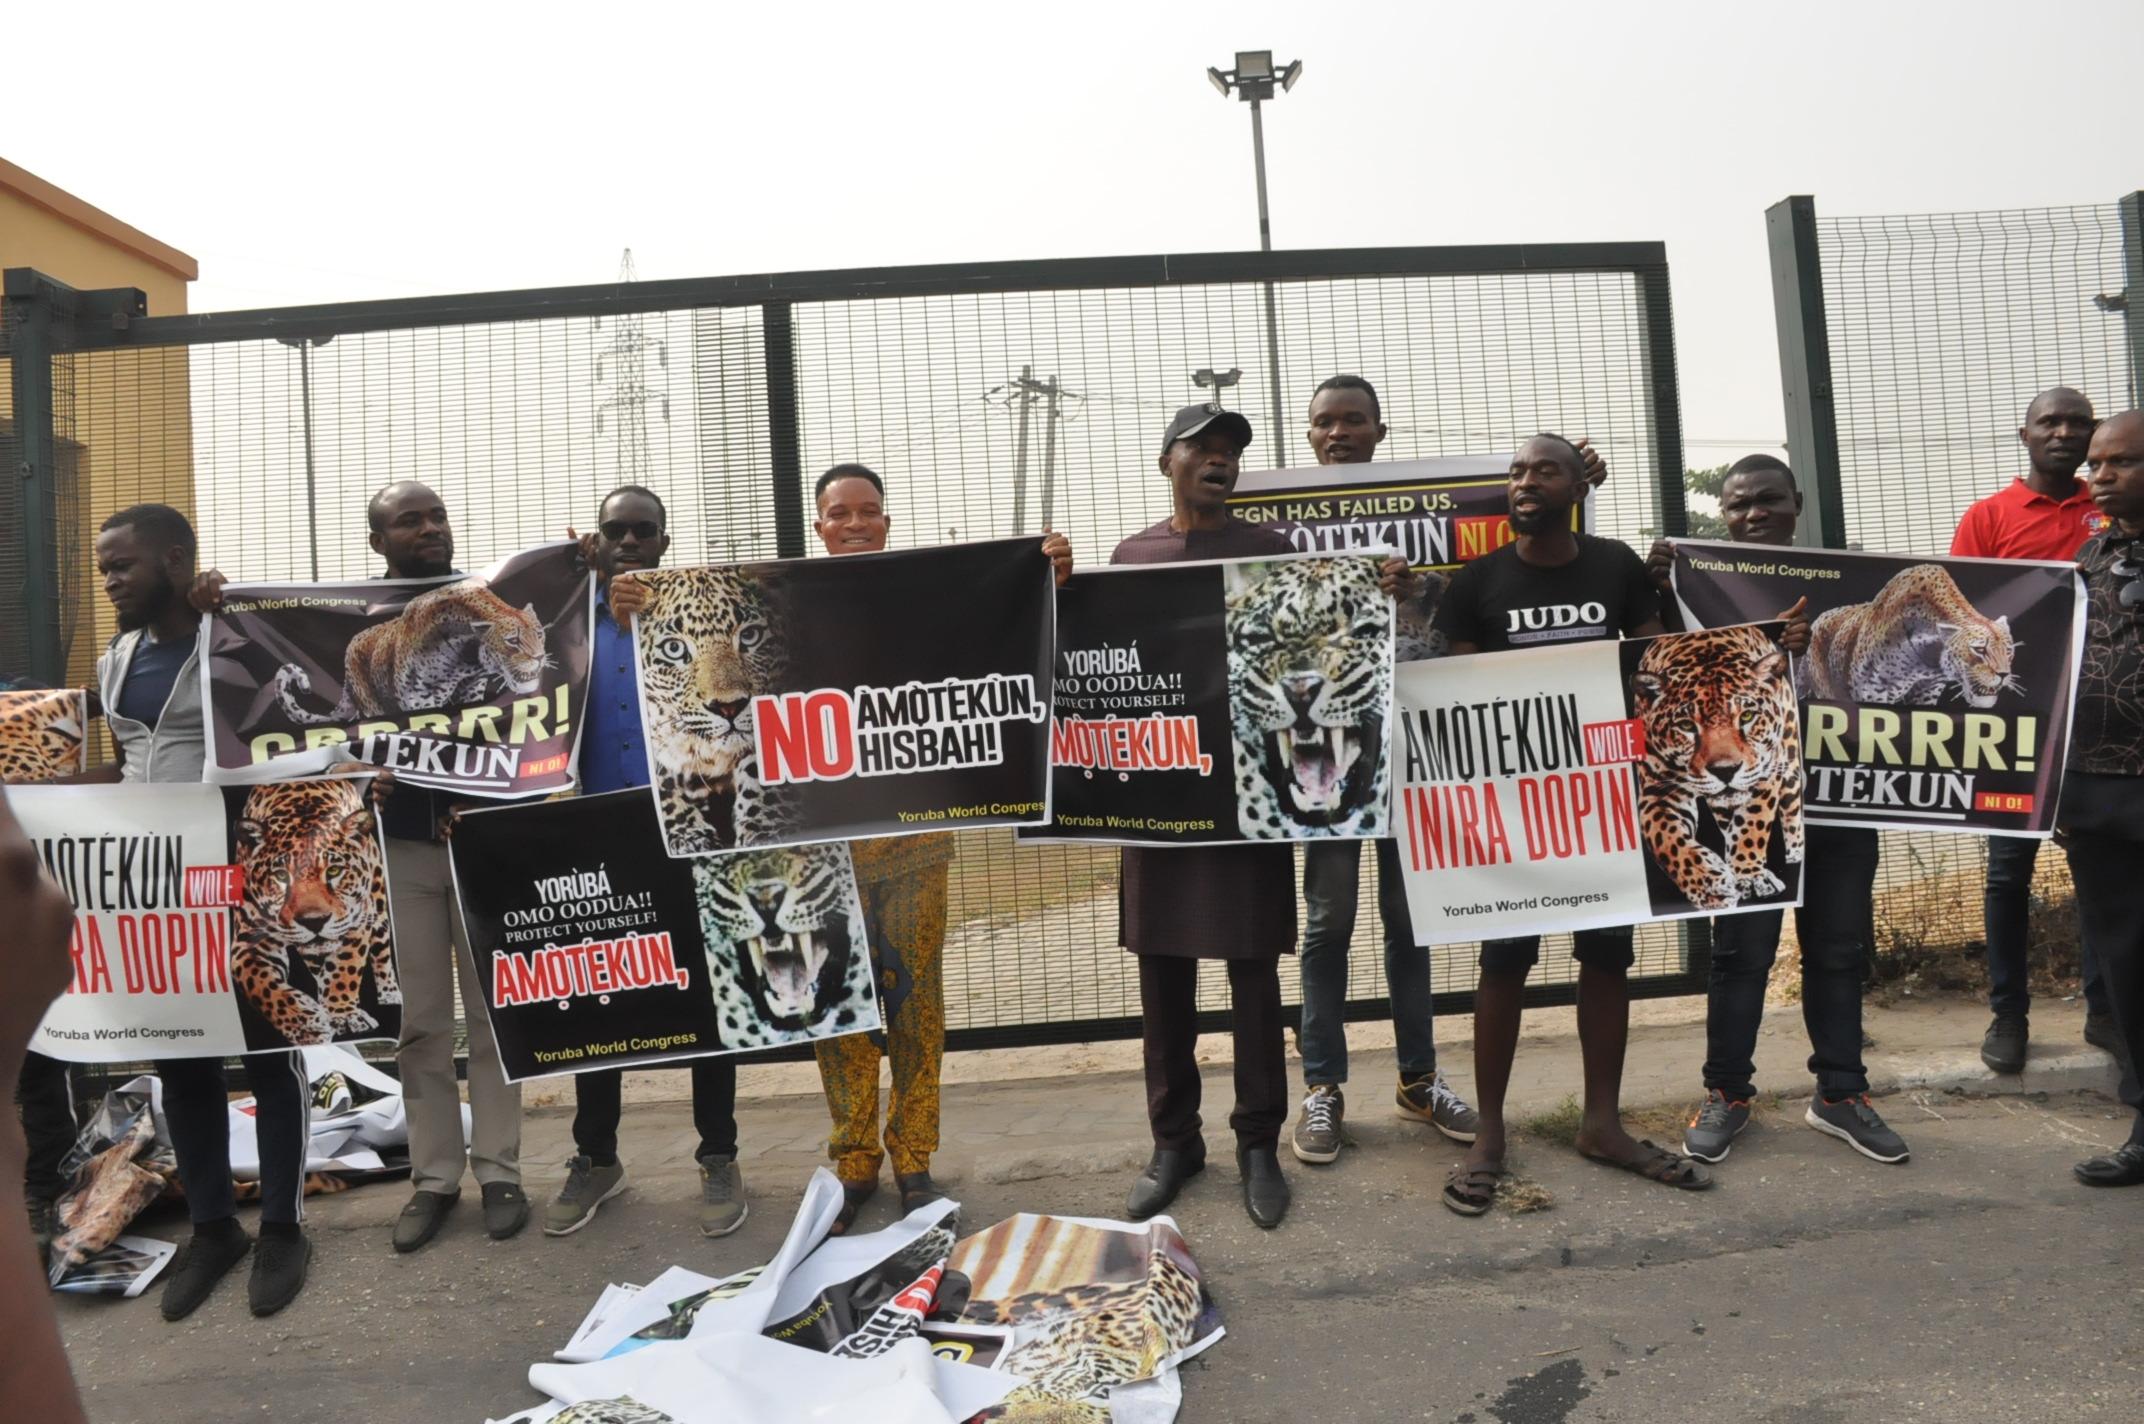 PHOTOS: Amotekun rally in Ojota Lagos